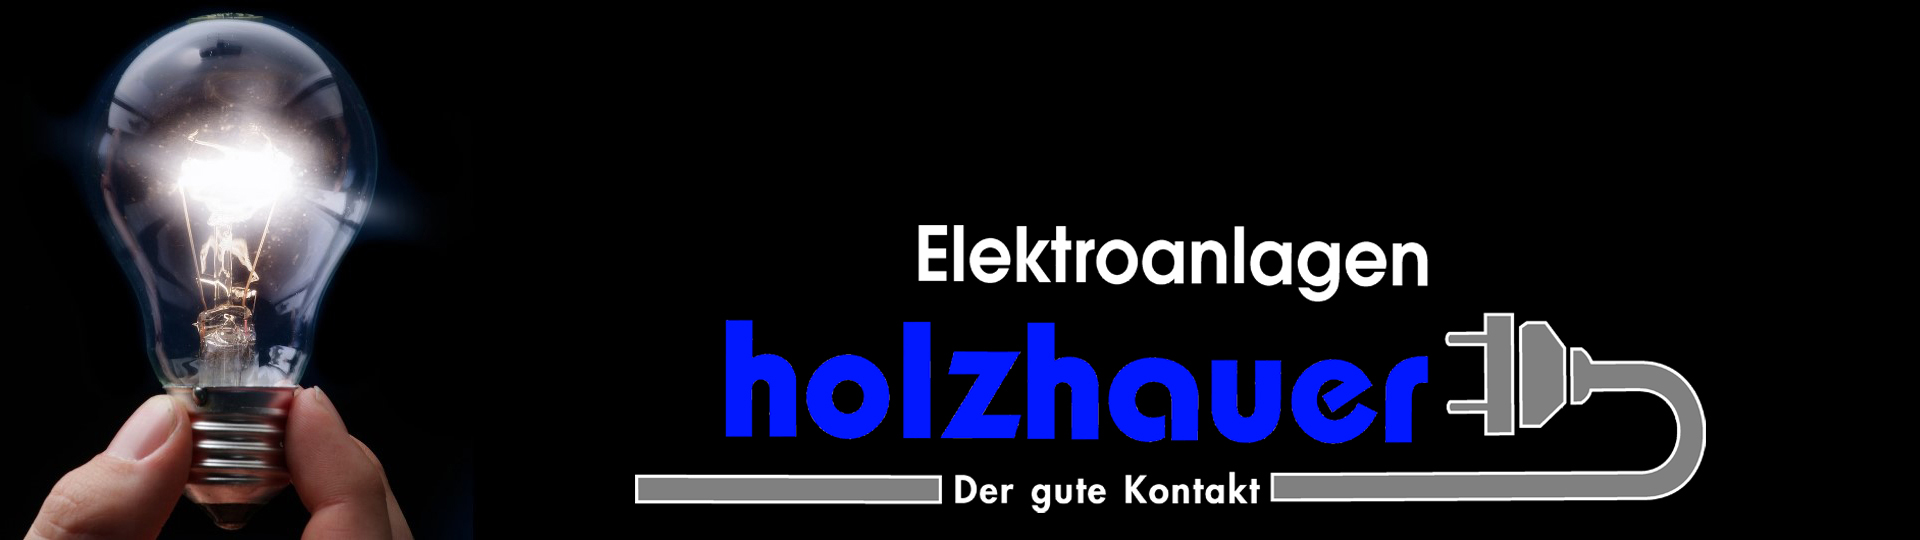 Holzhauer Slide 4 Licht